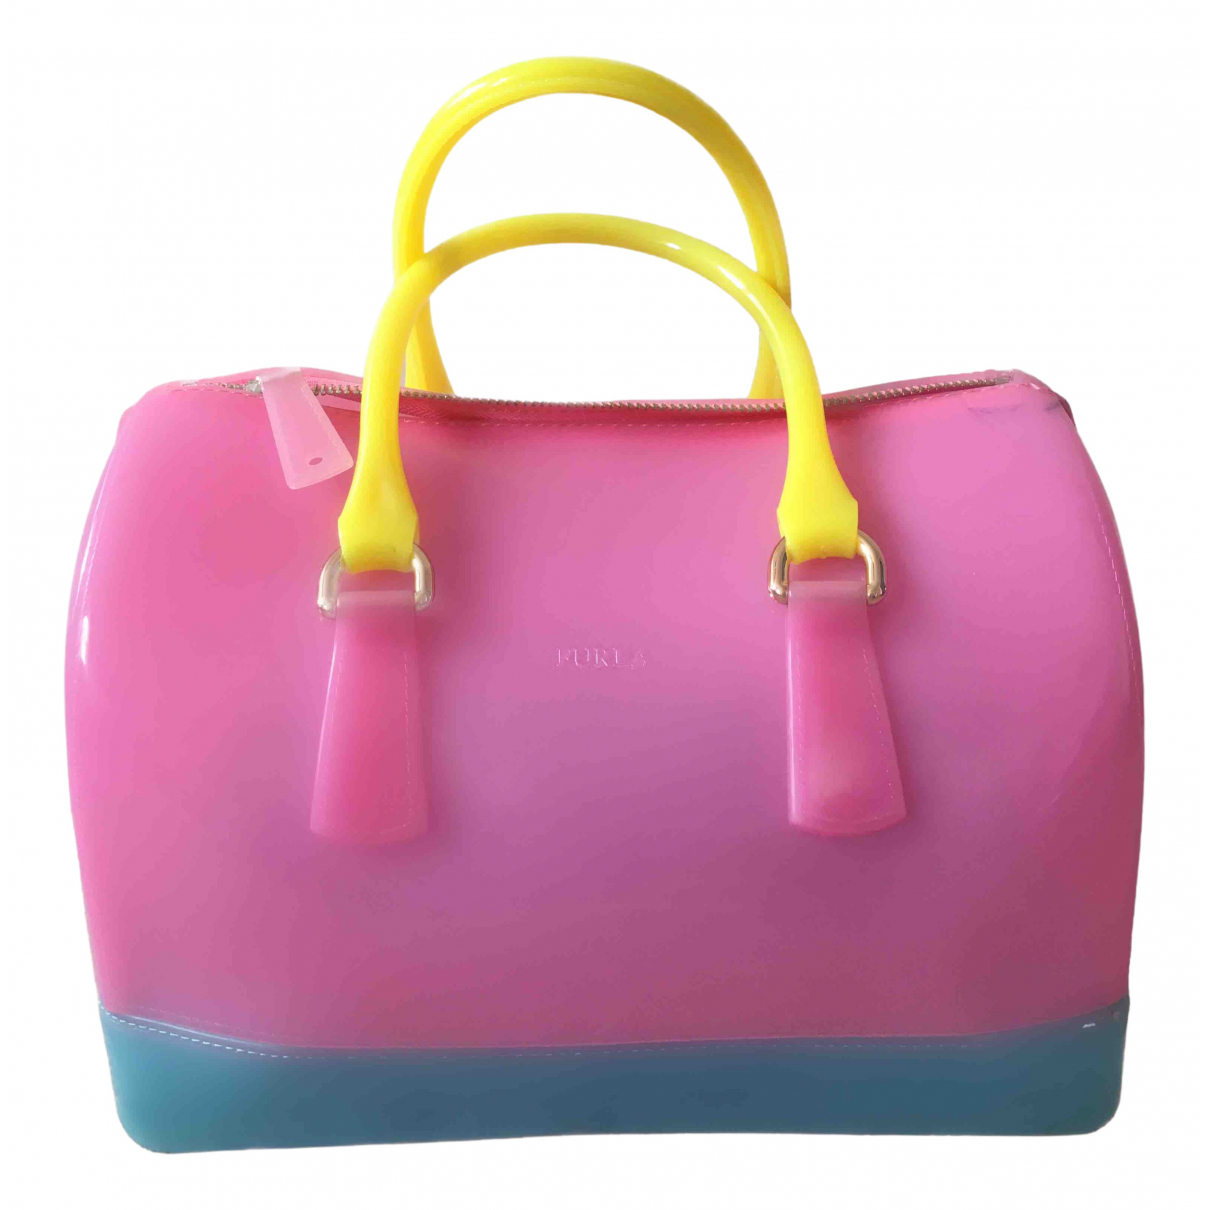 Furla Candy Bag Multicolour handbag for Women N